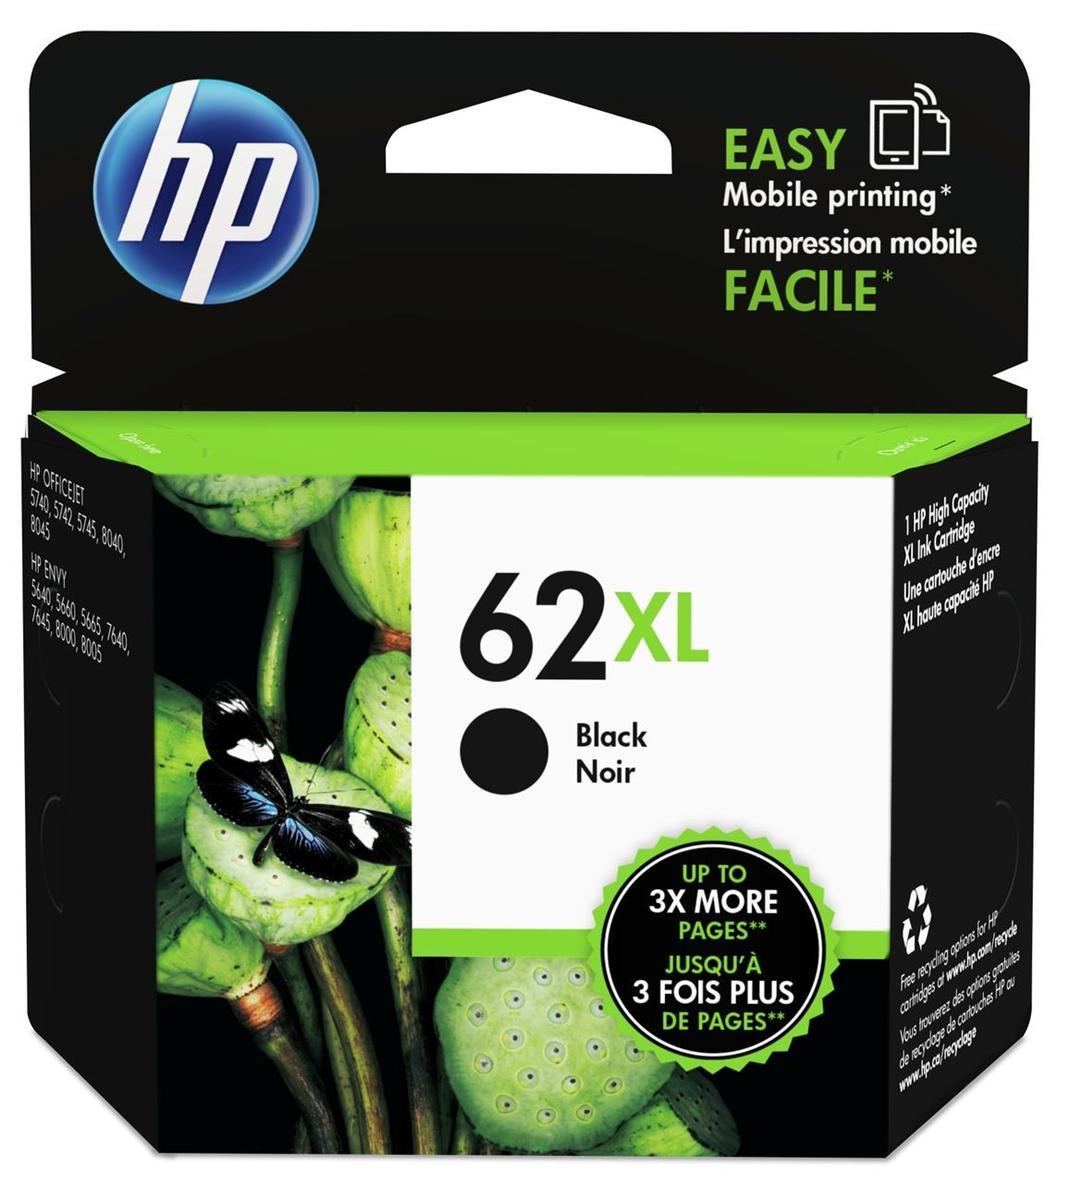 Hewlett Packard [HP] No. 62XL Inkjet Cartridge Black Ref C2P05AE